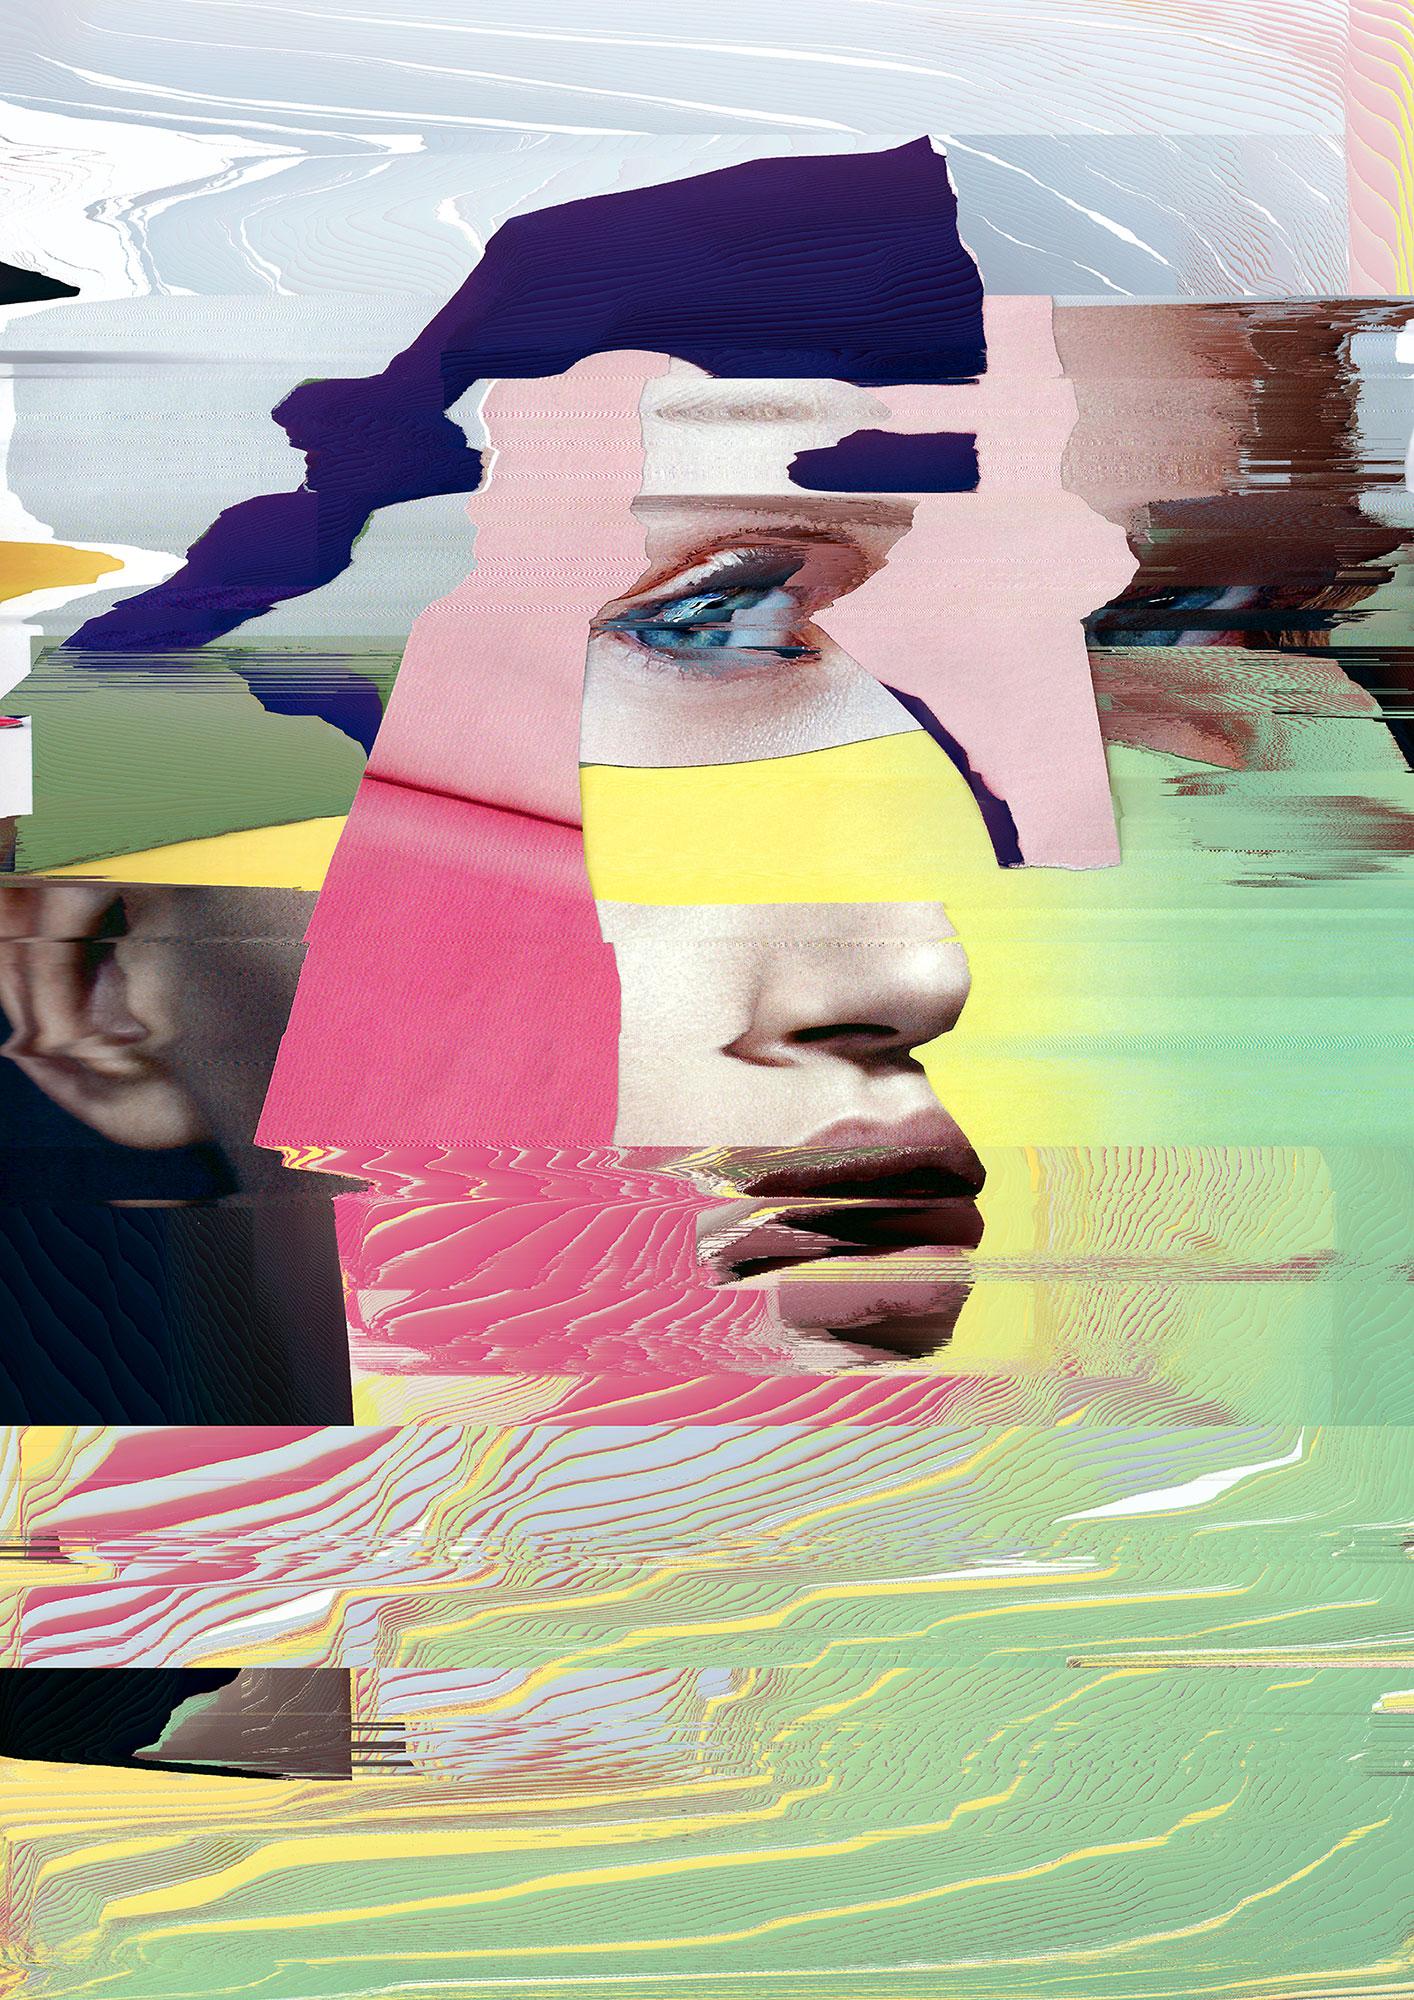 Ewa Doroszenko - Radical Beauty 01, photography